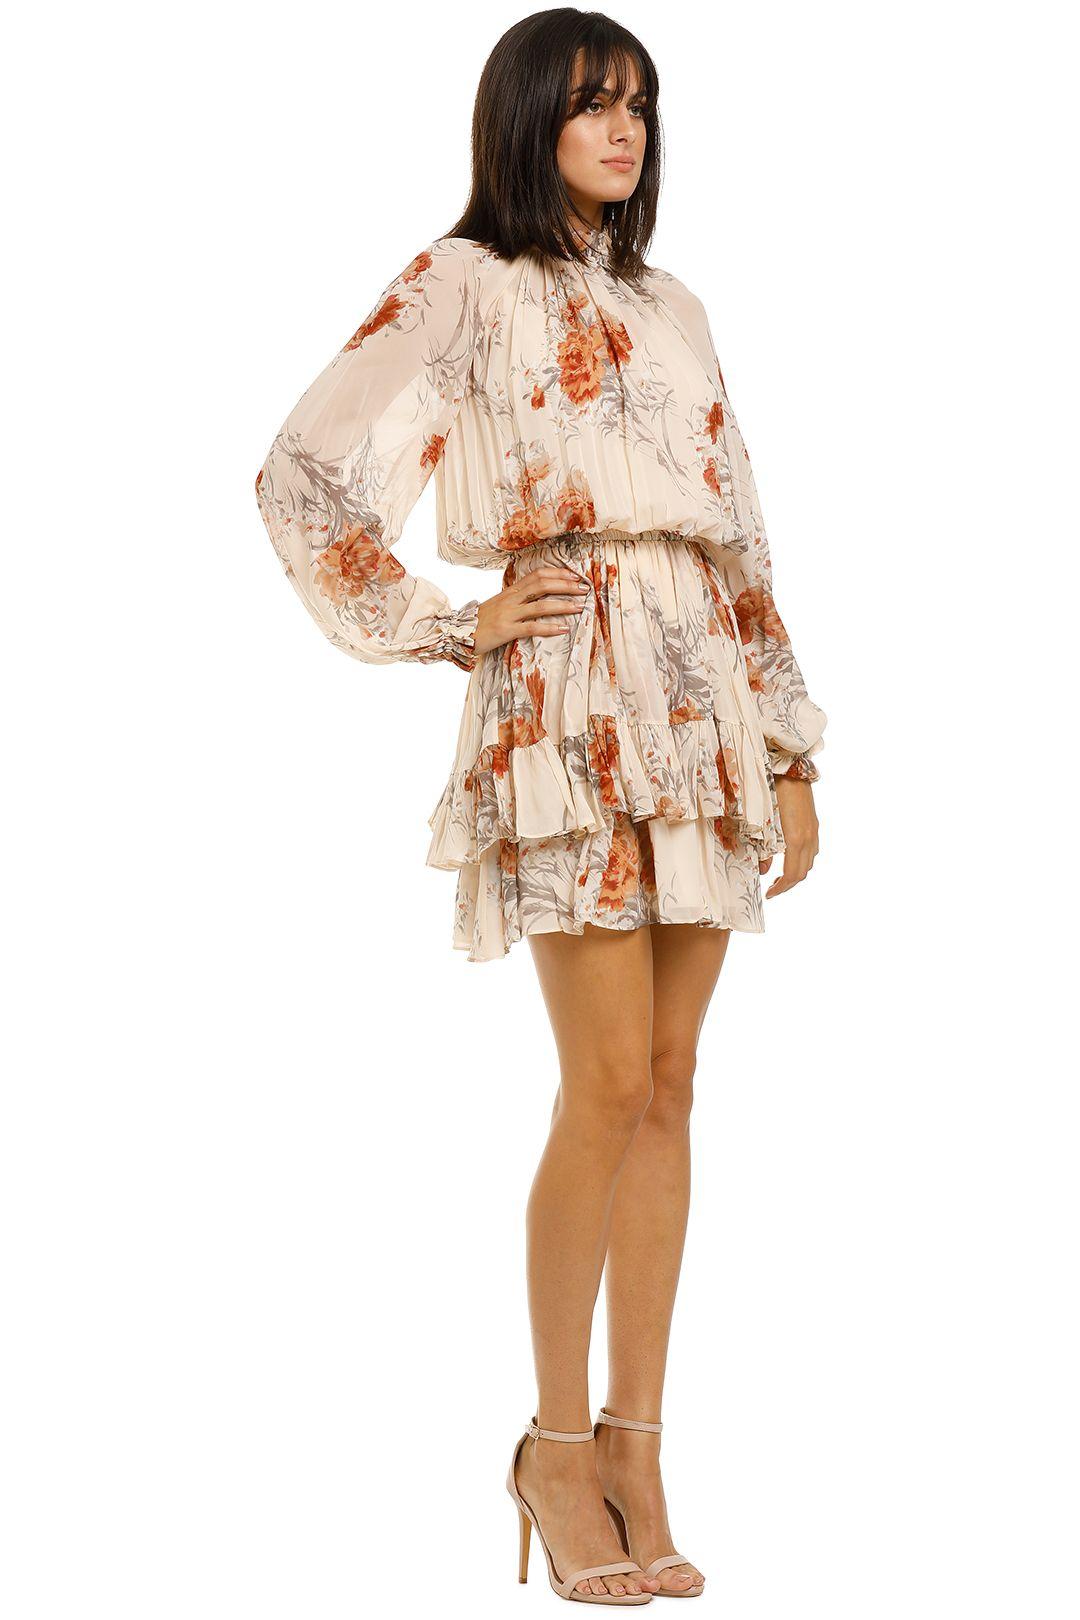 Lover-Angie-Mini-Dress-Sand-Side